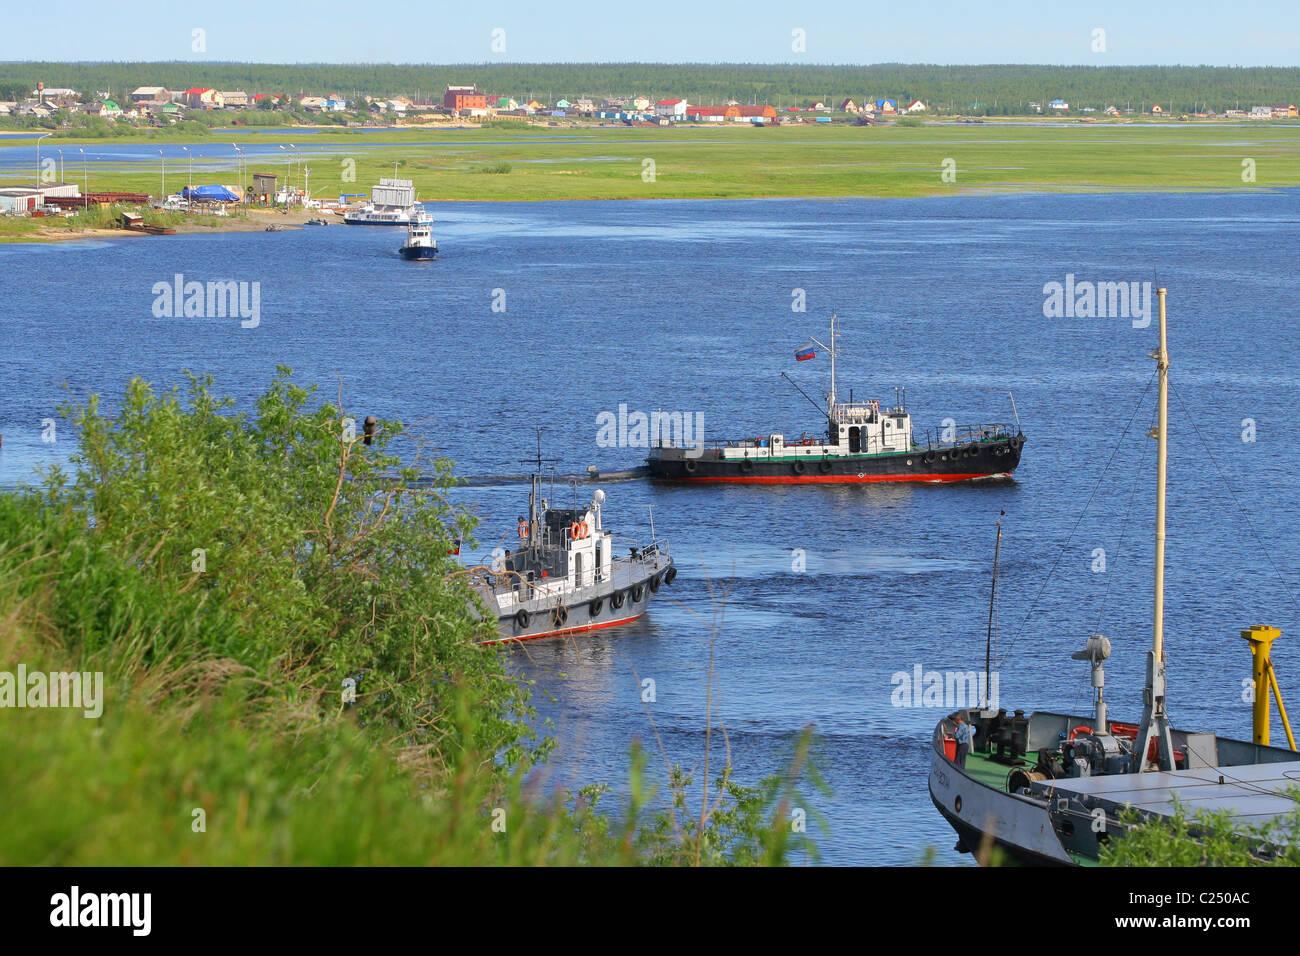 Navigation on the Ob River. Salekhard, Yamalo-Nenets Autonomous Okrug, RUSSIA - Stock Image